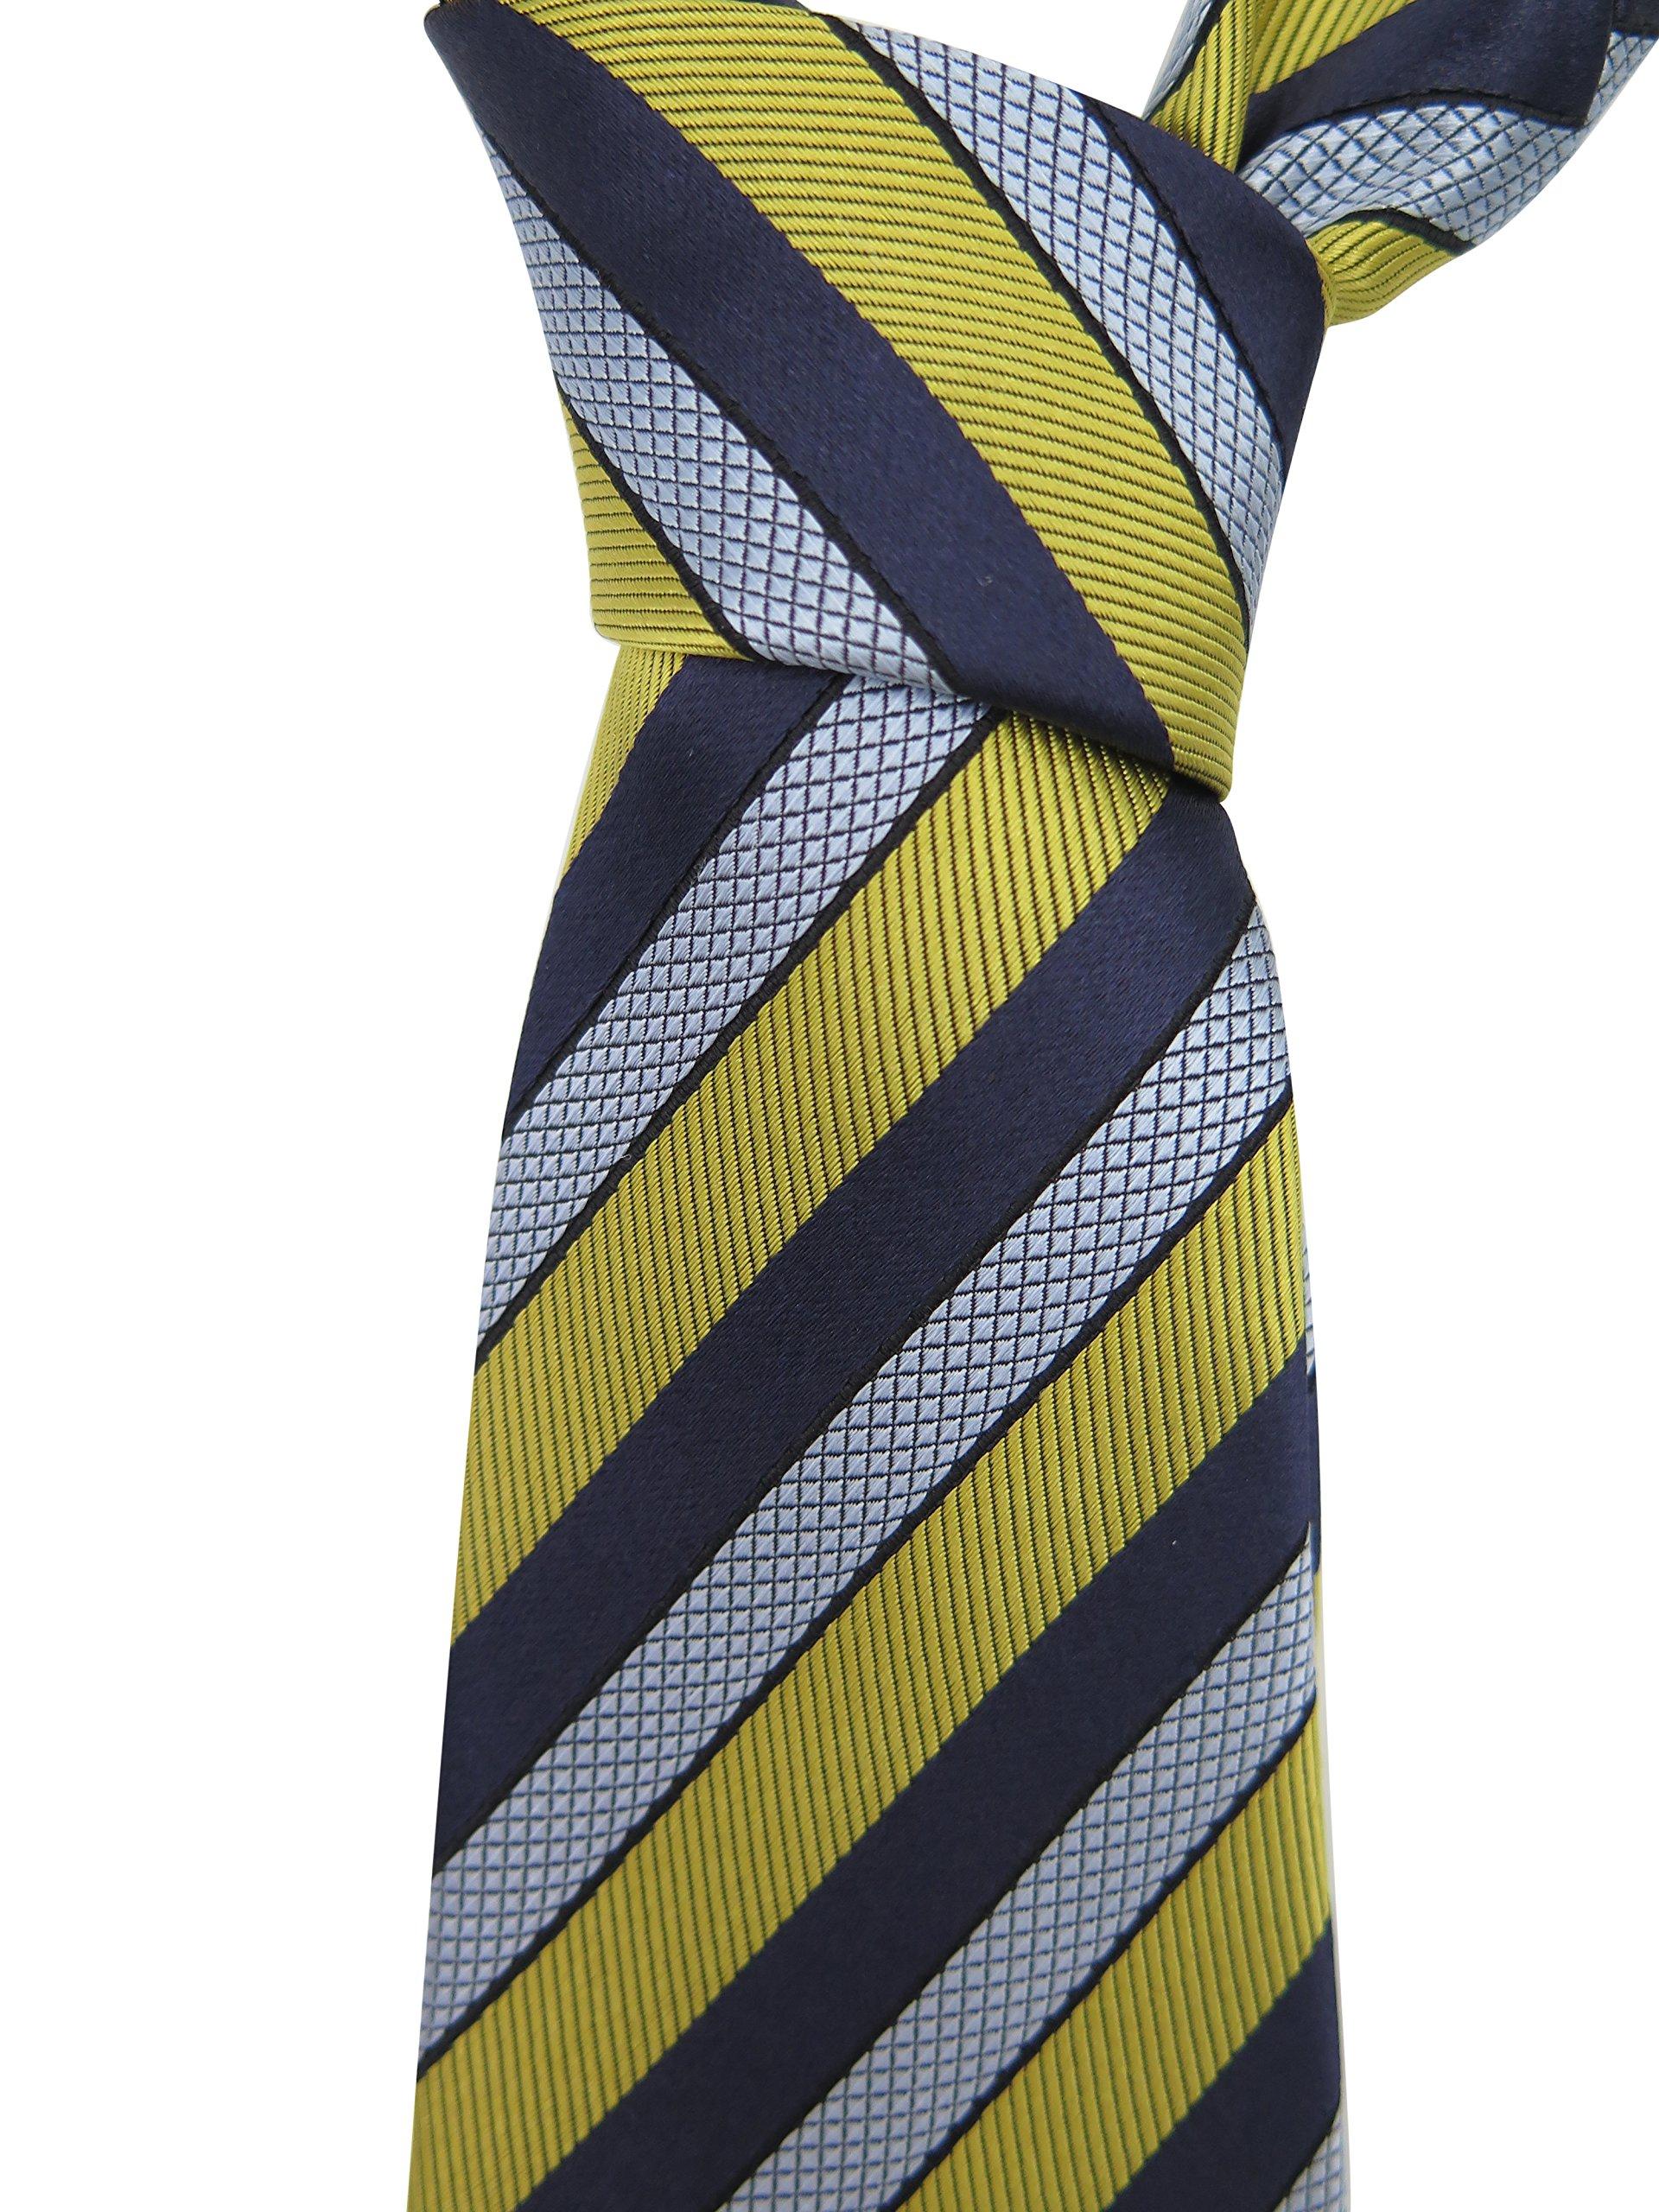 Ermenegildo Zegna Blue Gold Striped Silk Tie